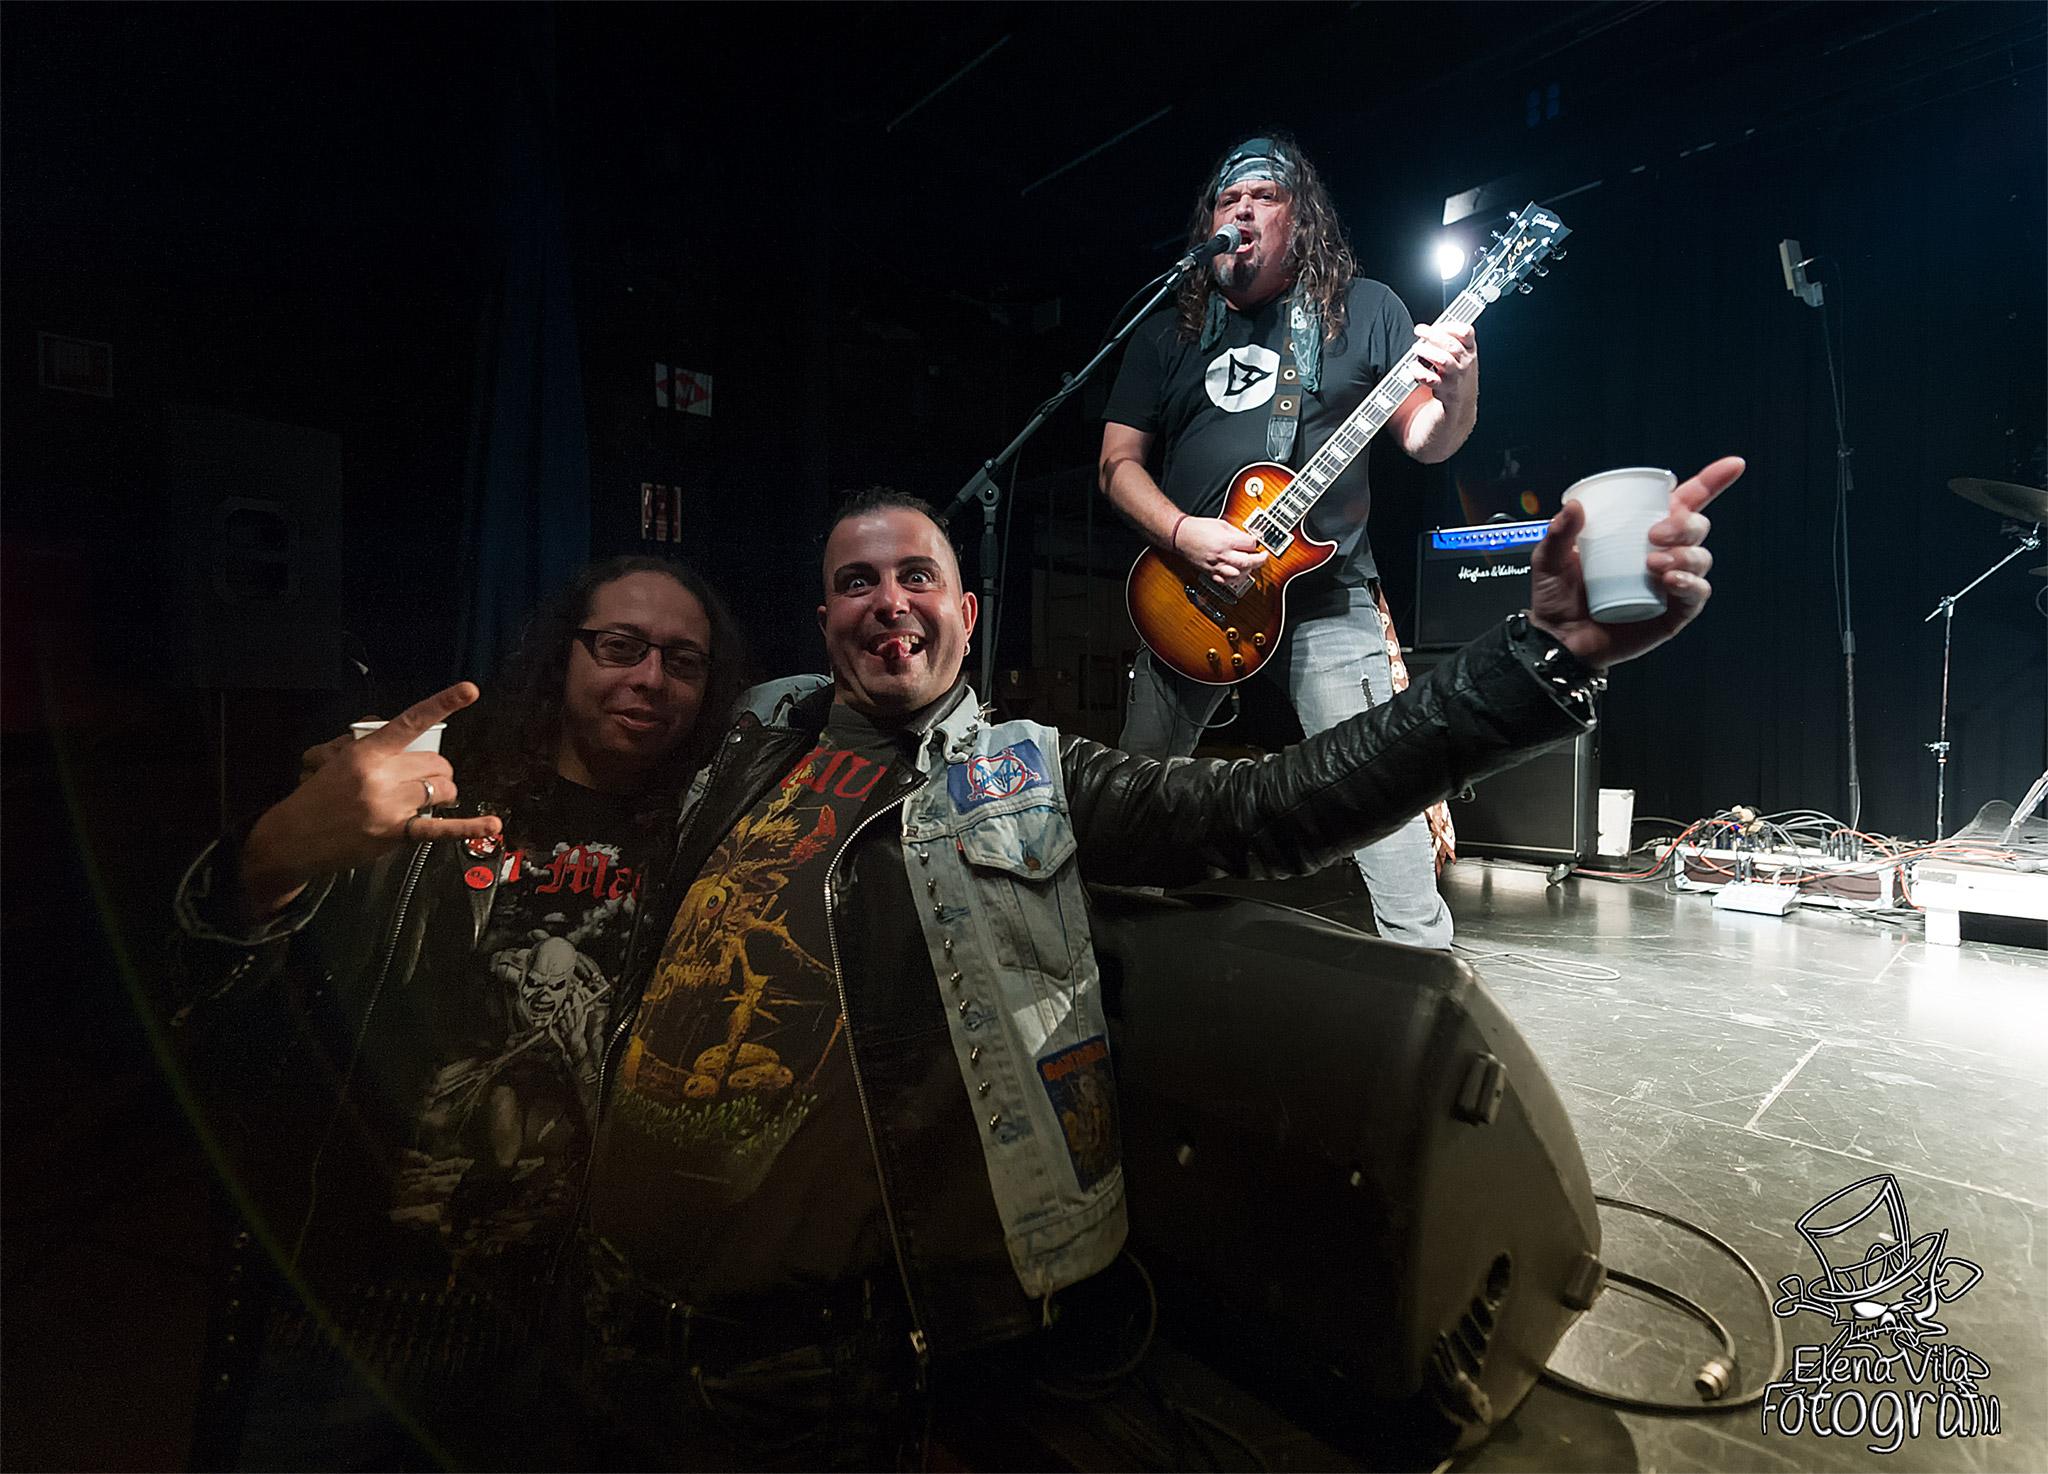 Elisma rock'n'civic 10